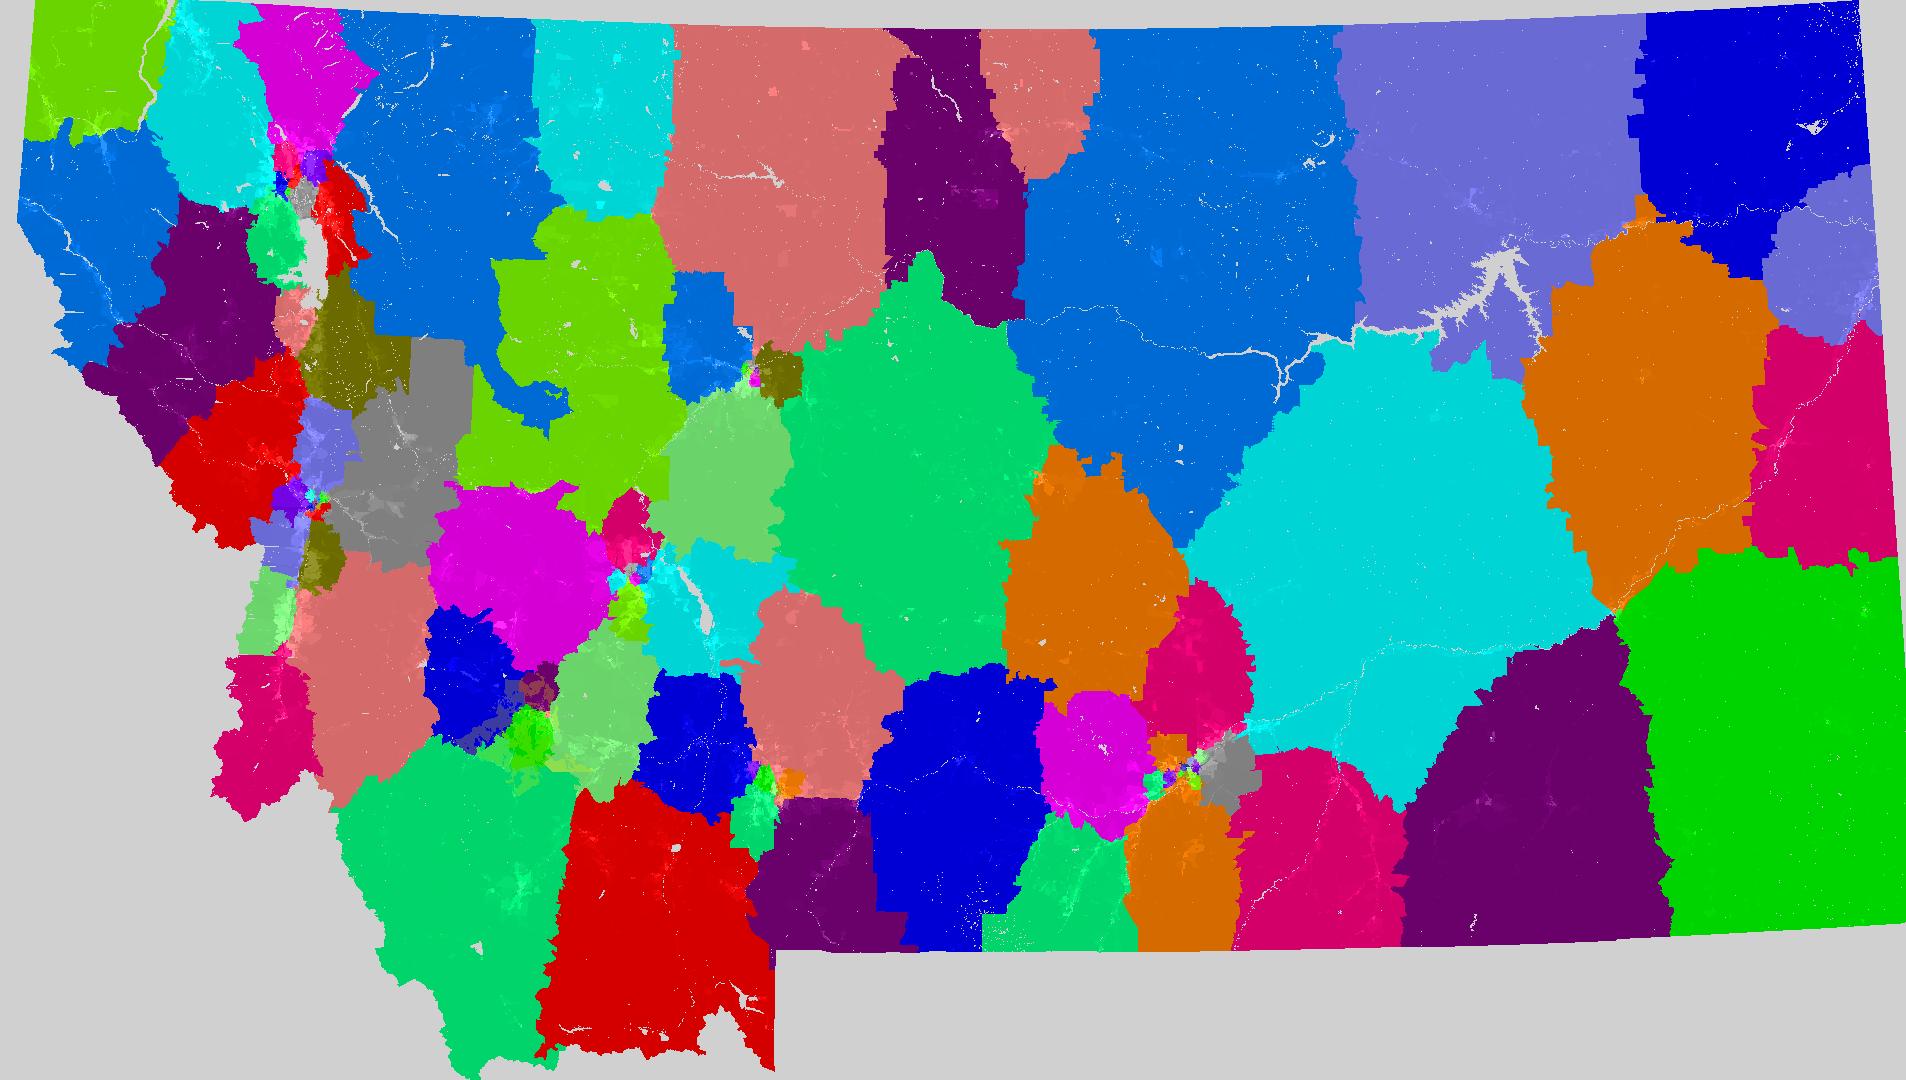 Montana House of Representatives Redistricting on house of representatives florida map, house of representatives current makeup, house of representatives apportionment map, house of representatives map 2014,